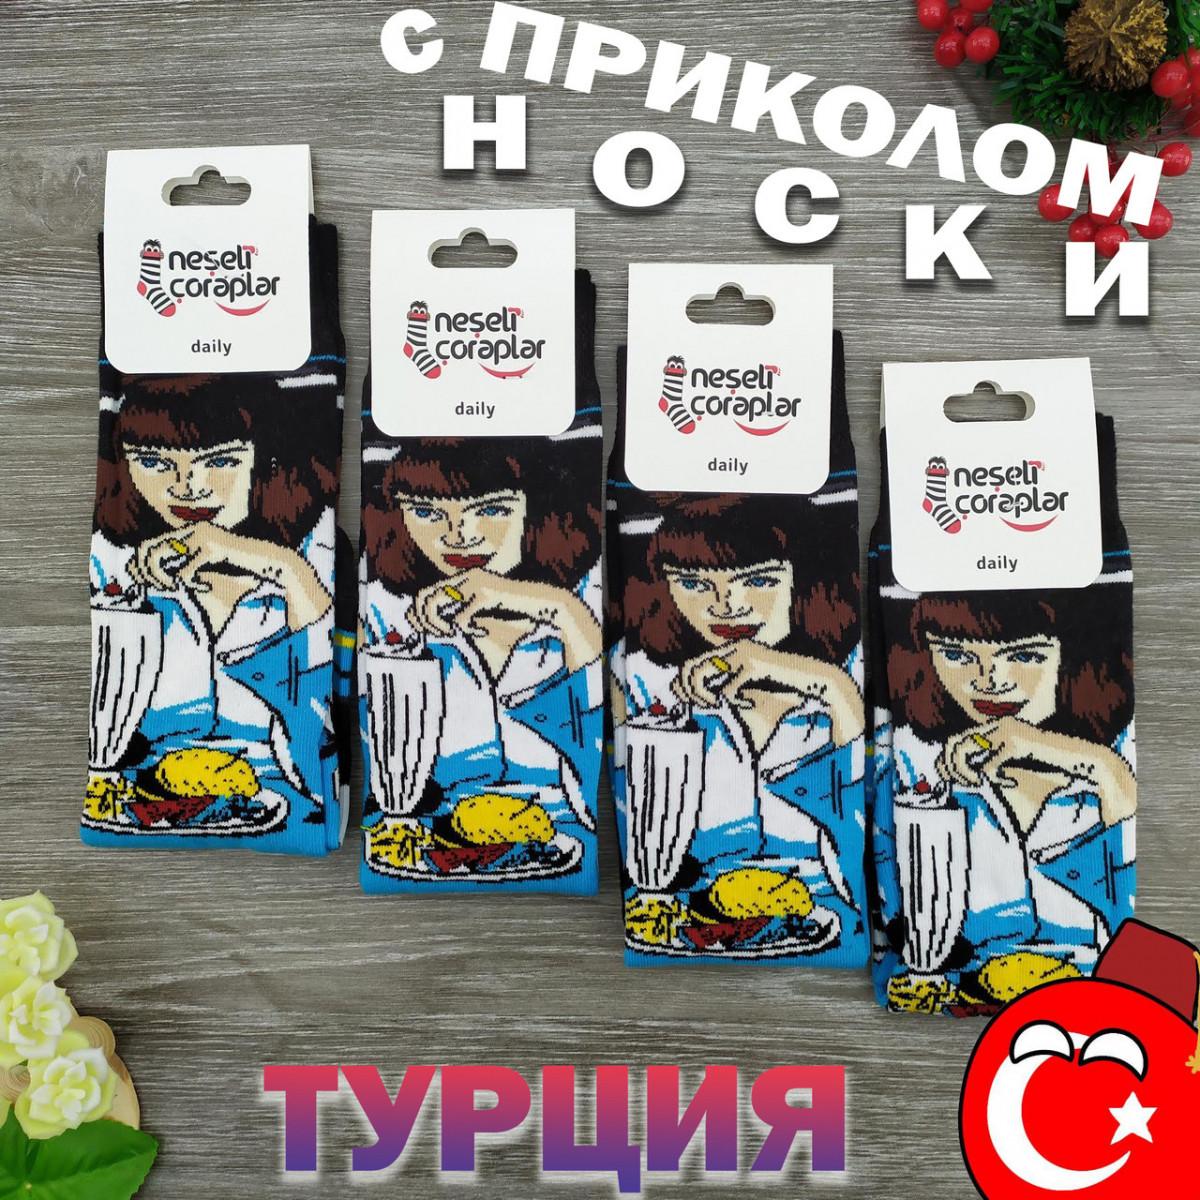 Носки с приколами демисезонные Neseli Coraplar Mia Wallece 7183 Турция one size (37-44р) 20034689